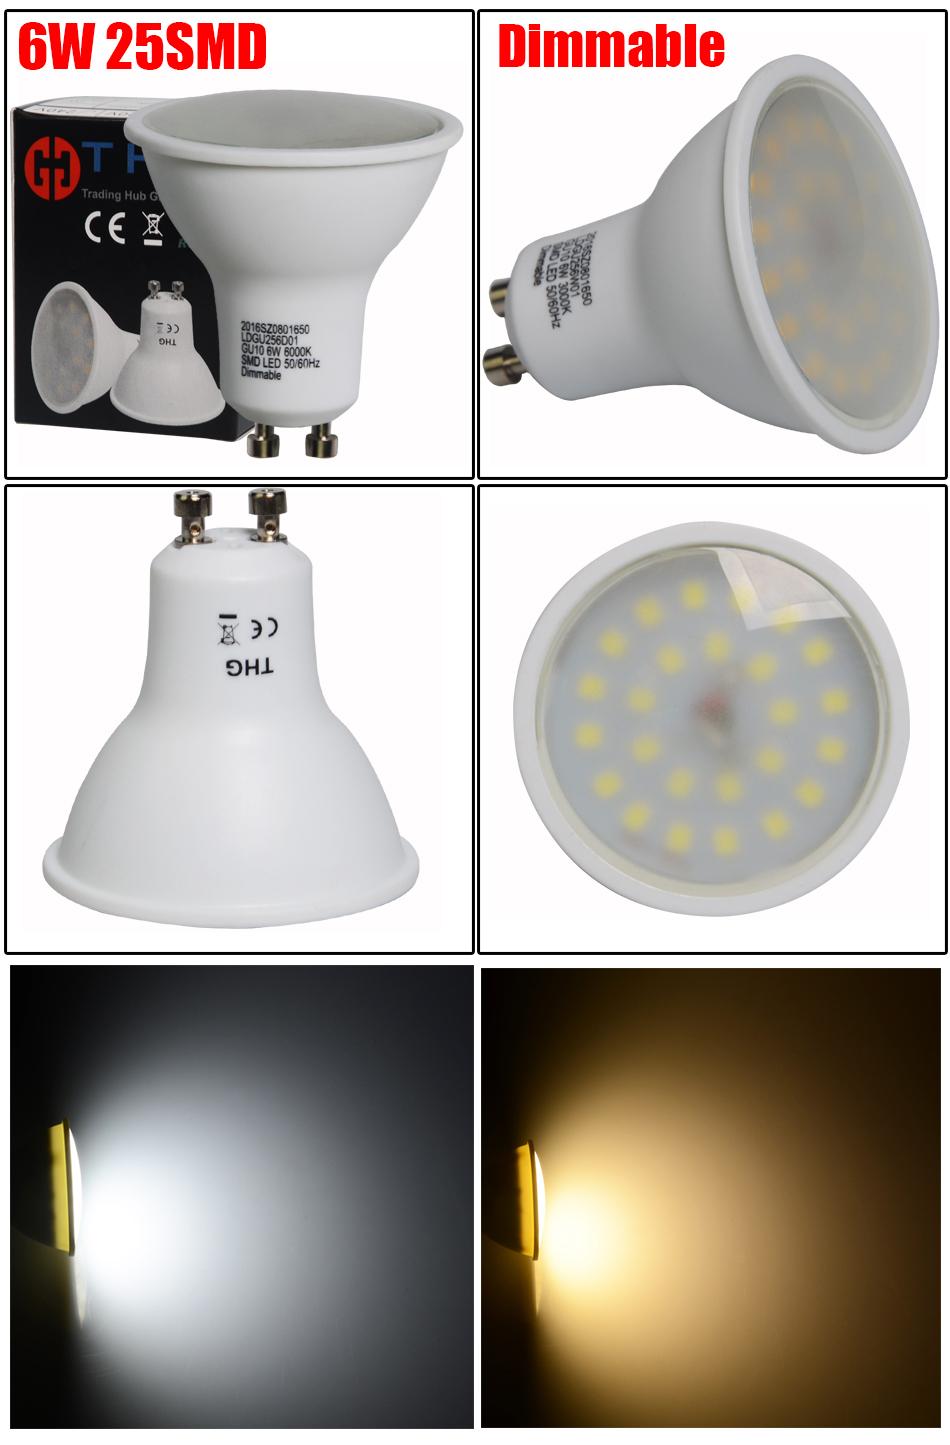 6W GU10 Dimmable LED Bulbs GU10 Lamps Spot Light Day Warm